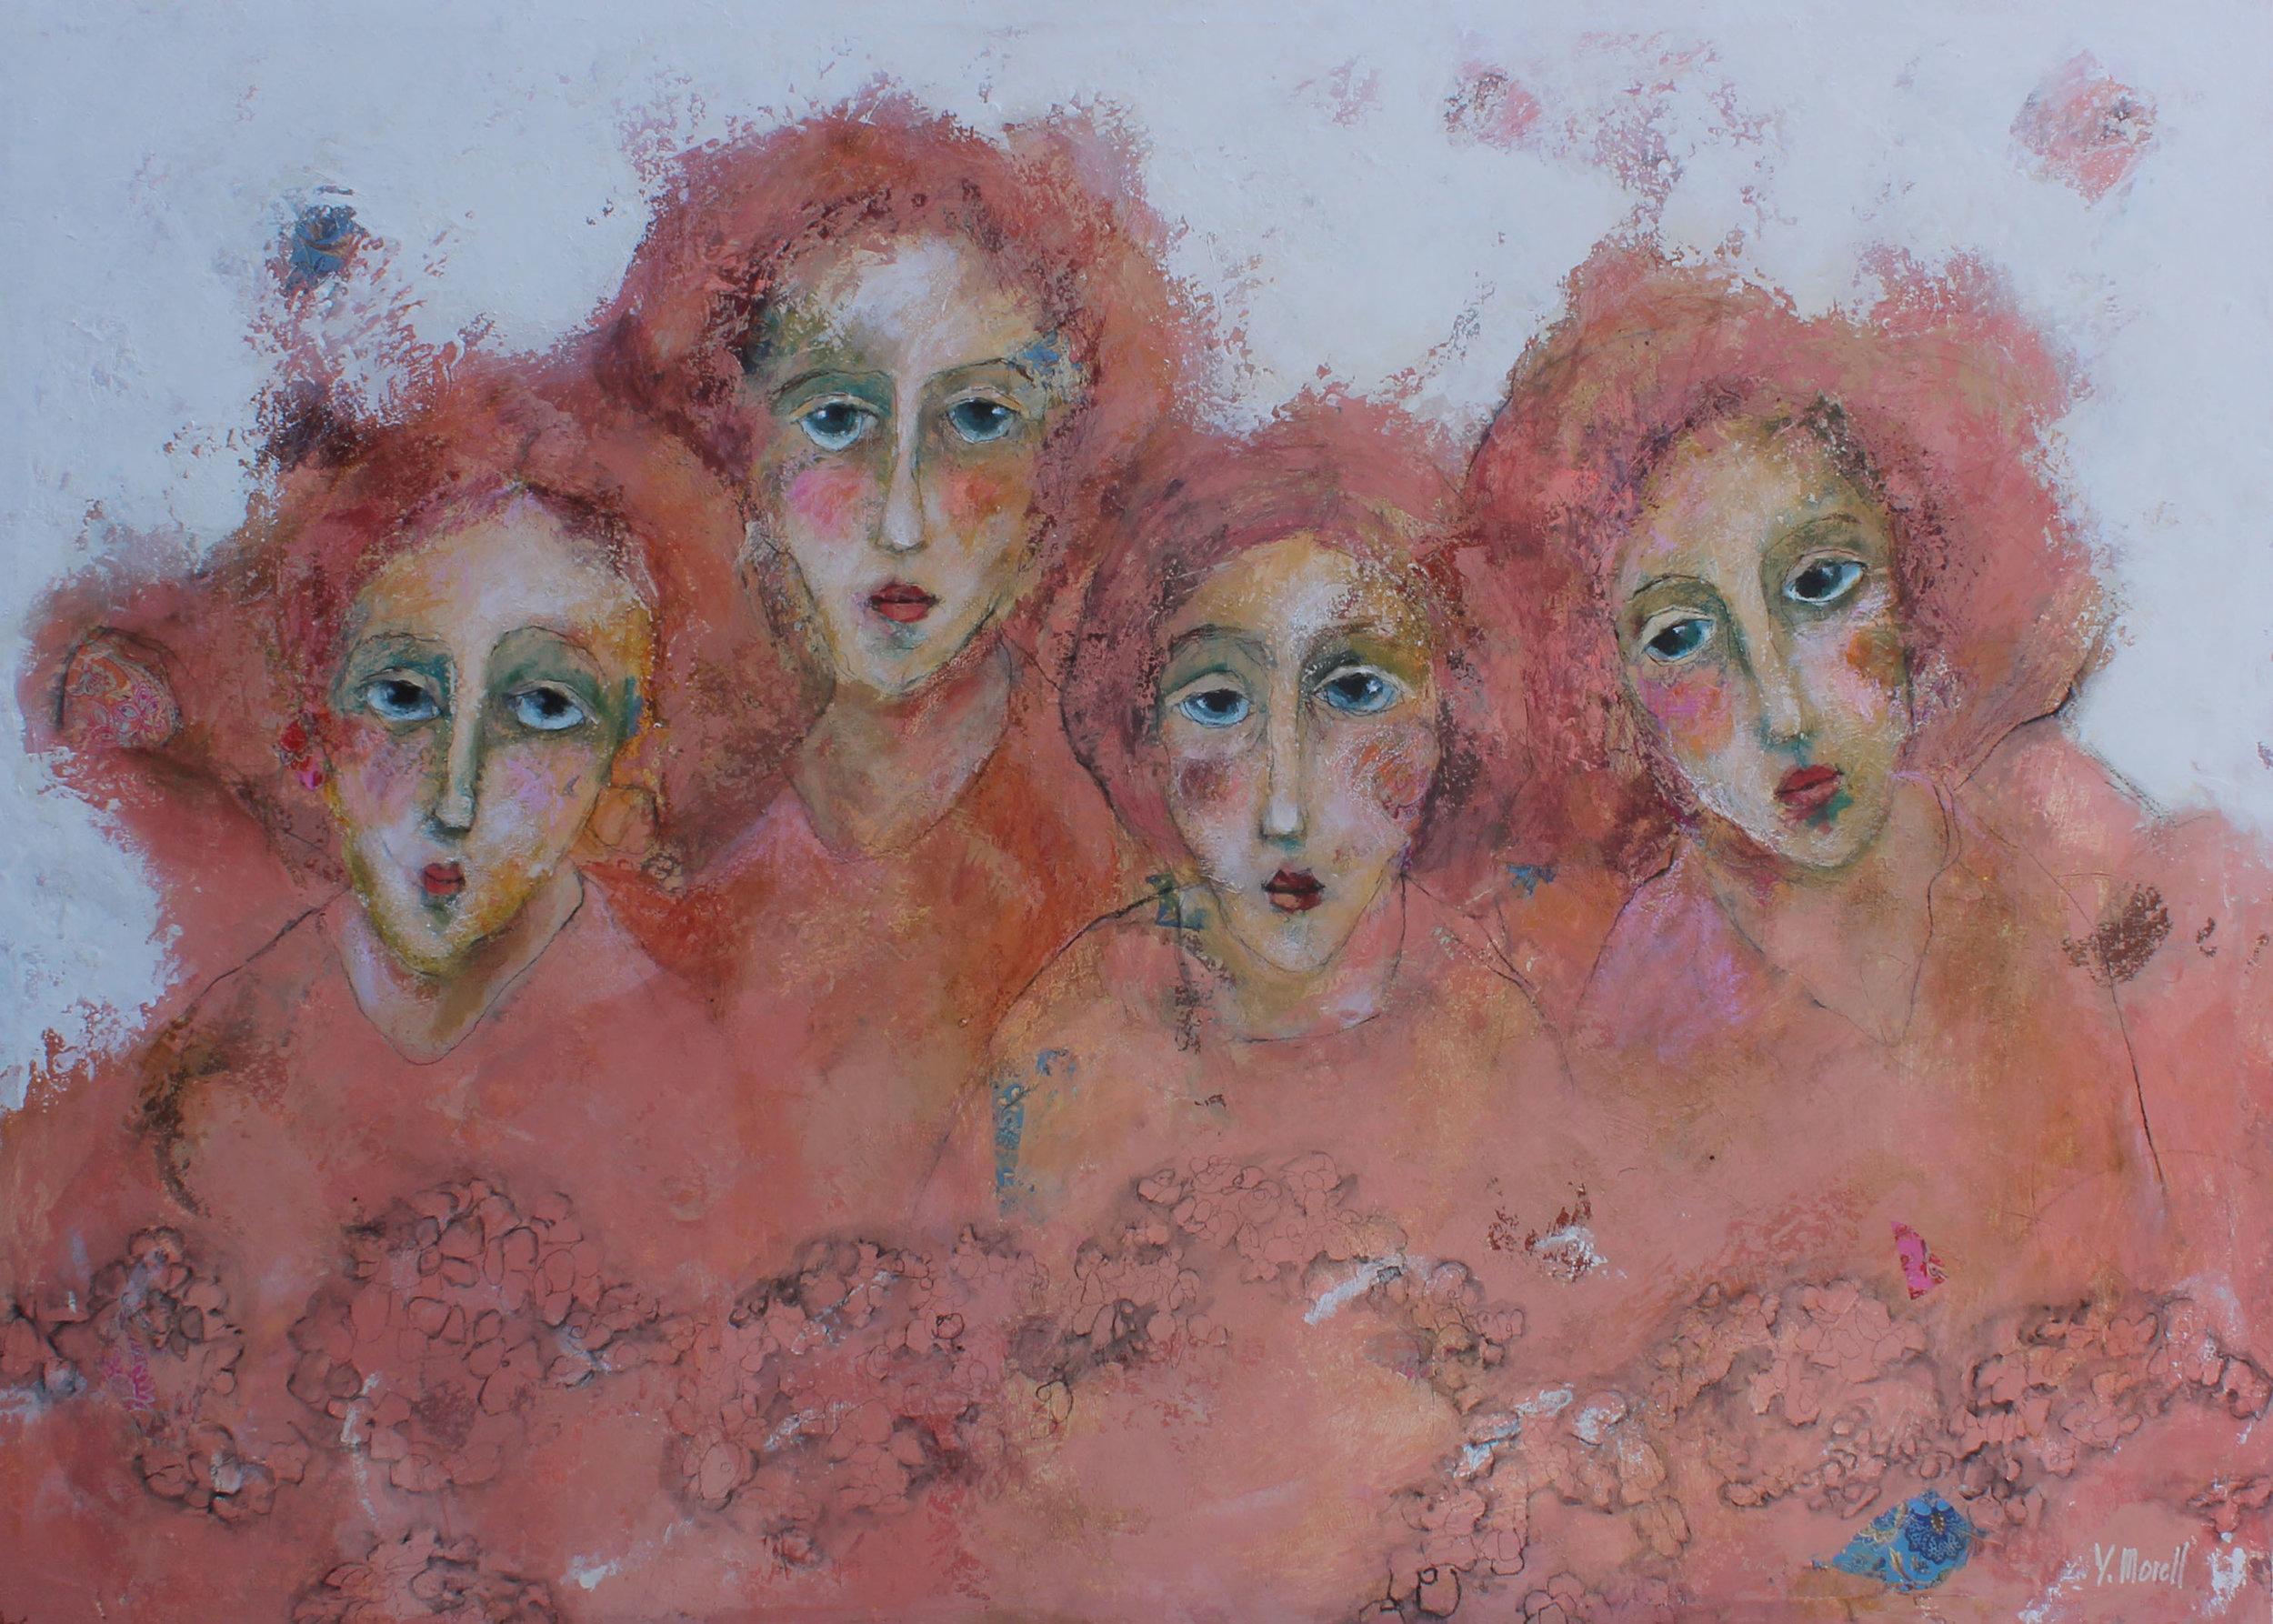 Vieux rose girls Yvonne Morell